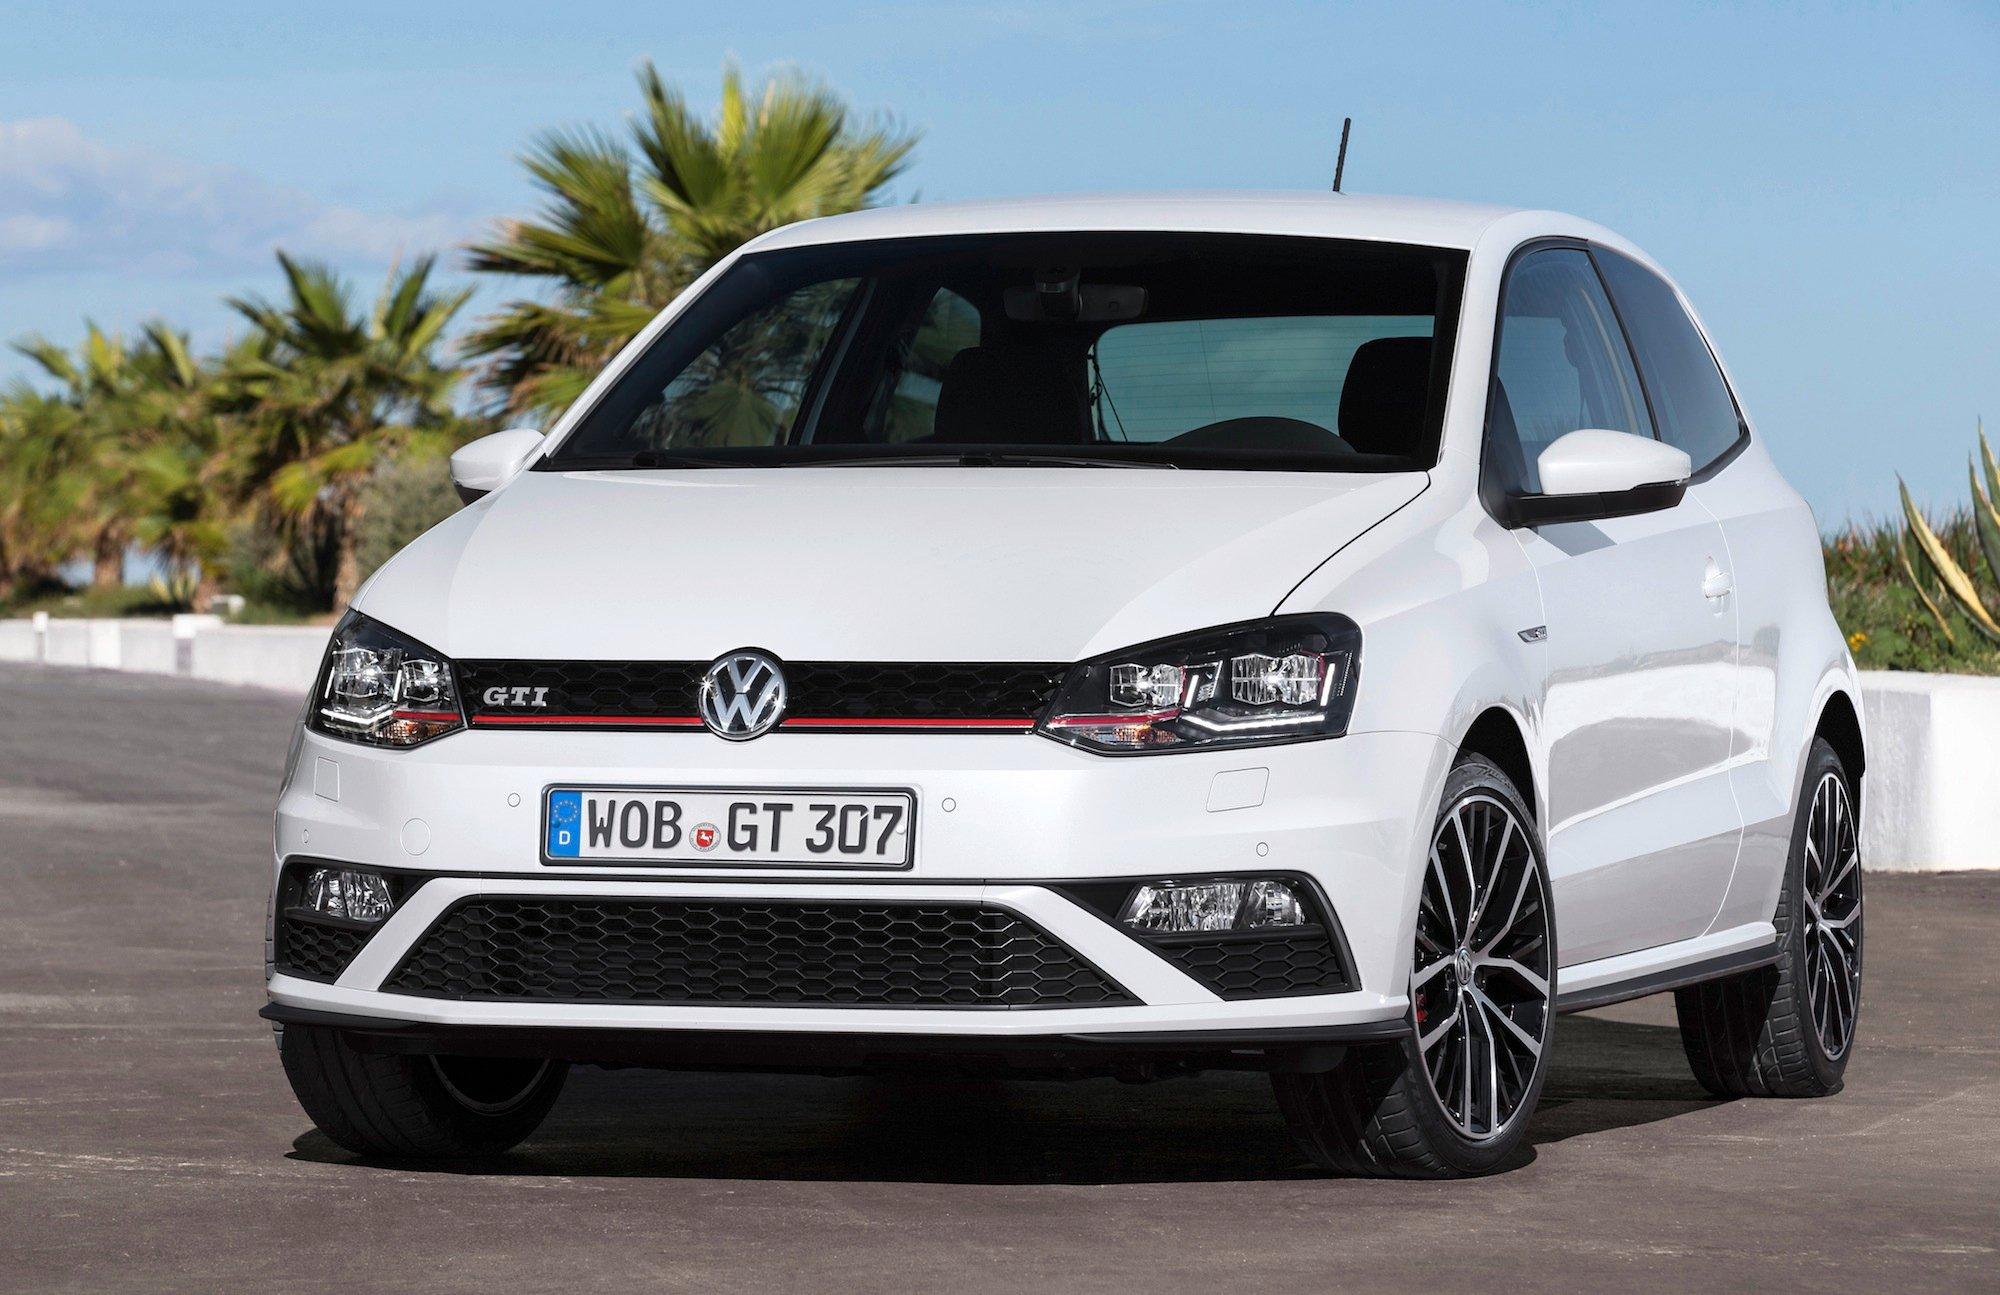 2015 Volkswagen Polo GTI Review - photos | CarAdvice